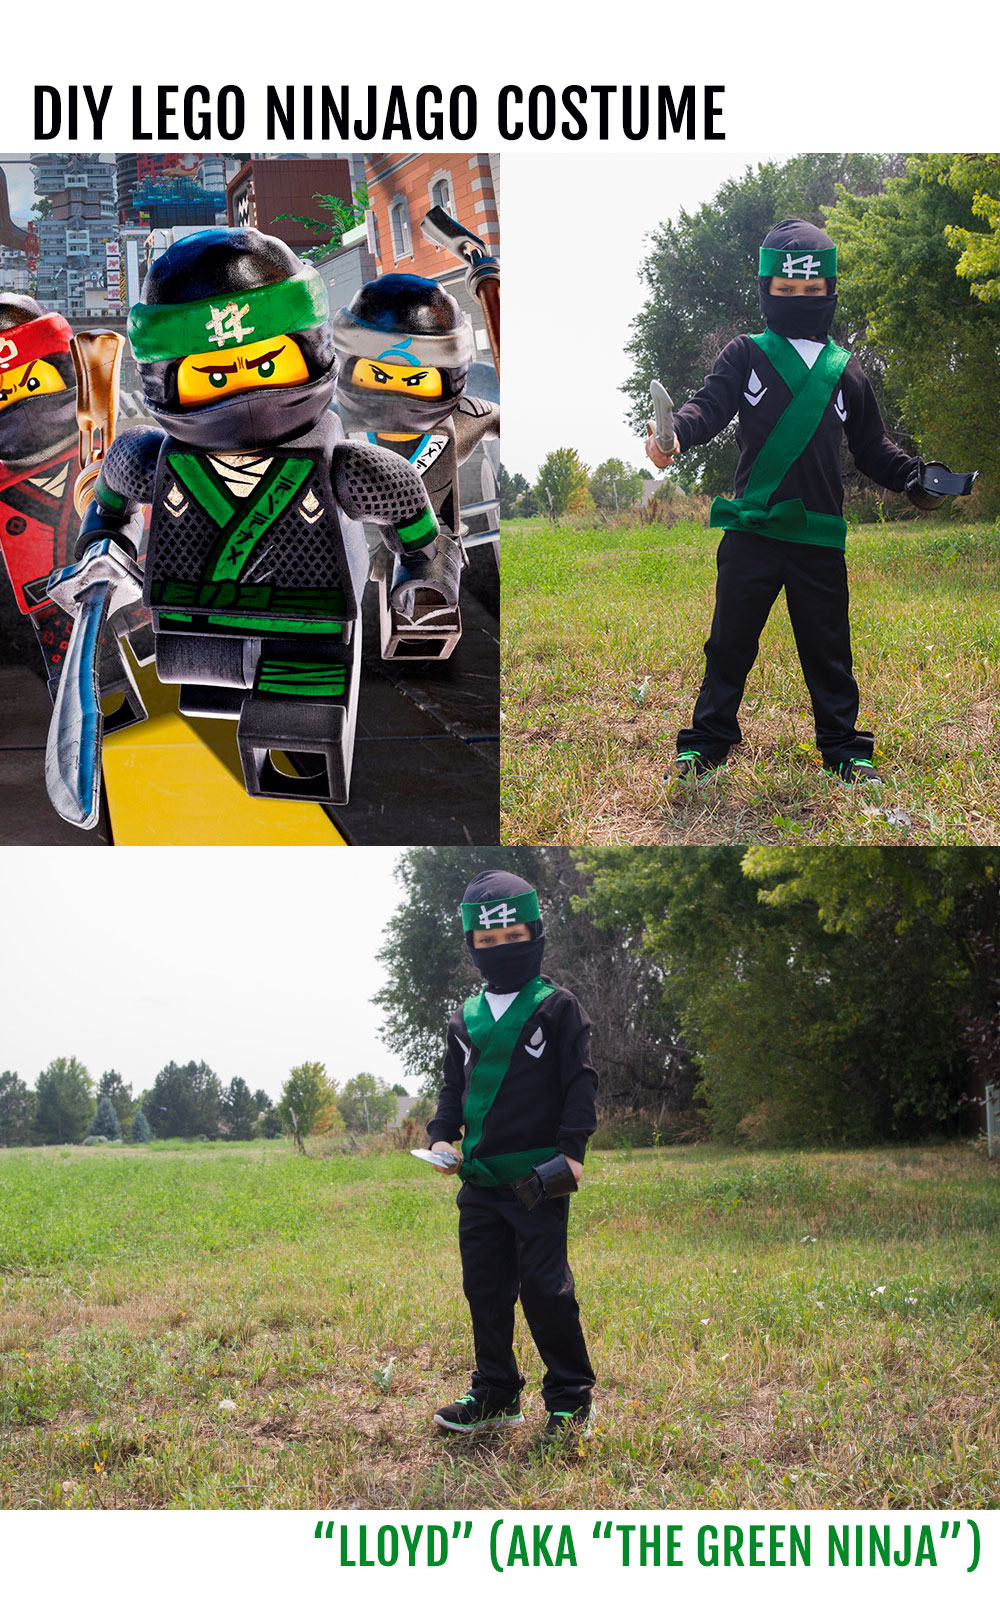 Dguisement ninjago lloyd wi41 humatraffin frais diy lego ninjago costume the mombot tk64 solutioingenieria Images